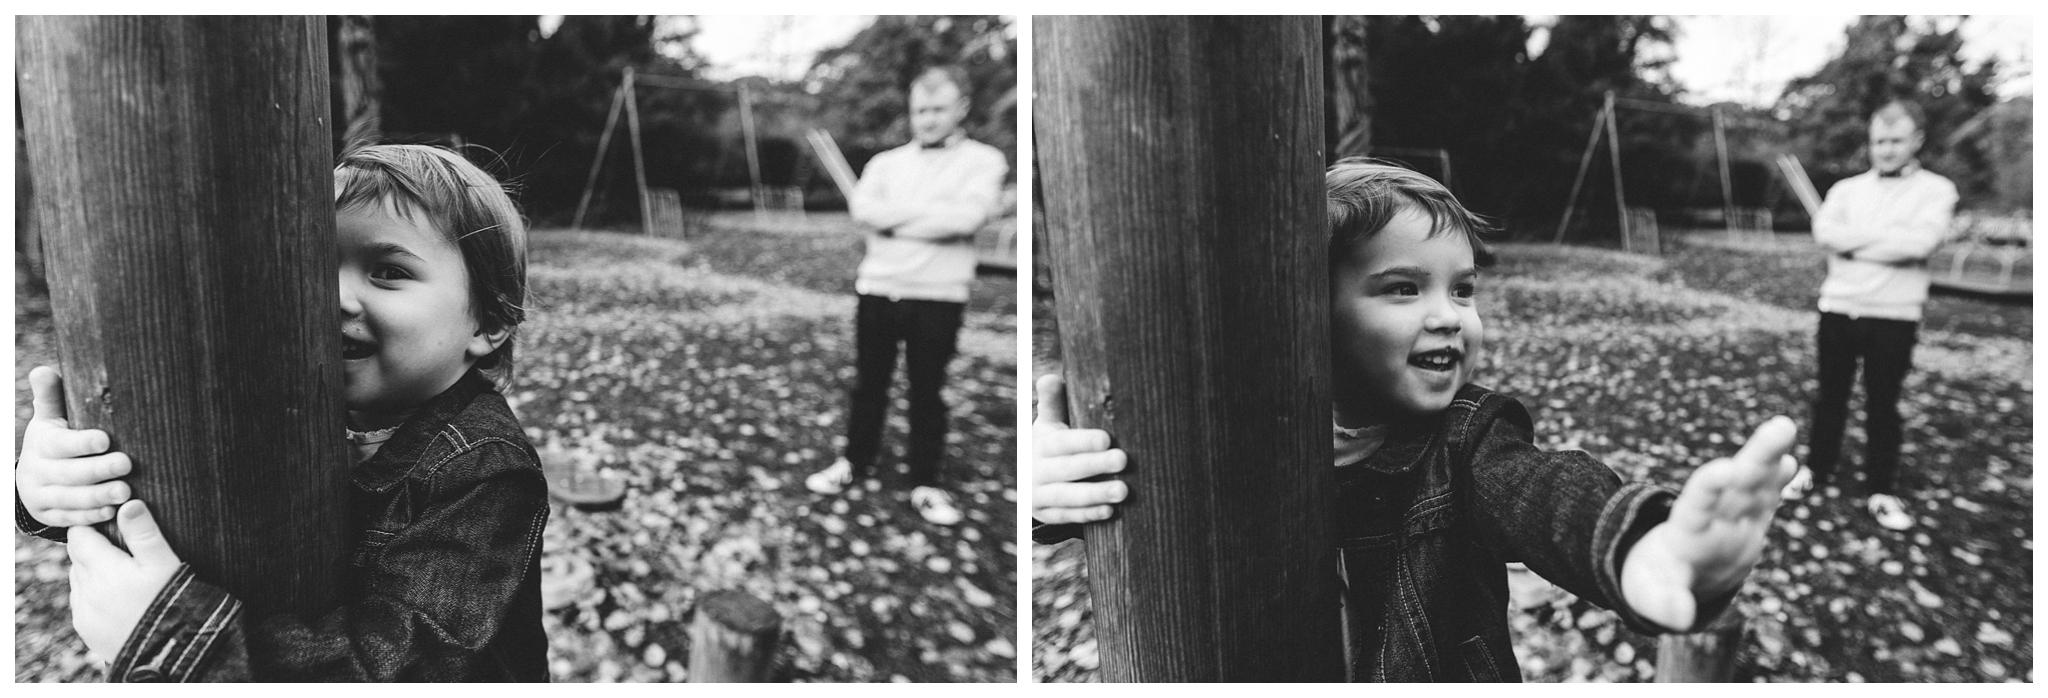 Autumn-family-portraits-birmingham-photographer_0010.jpg